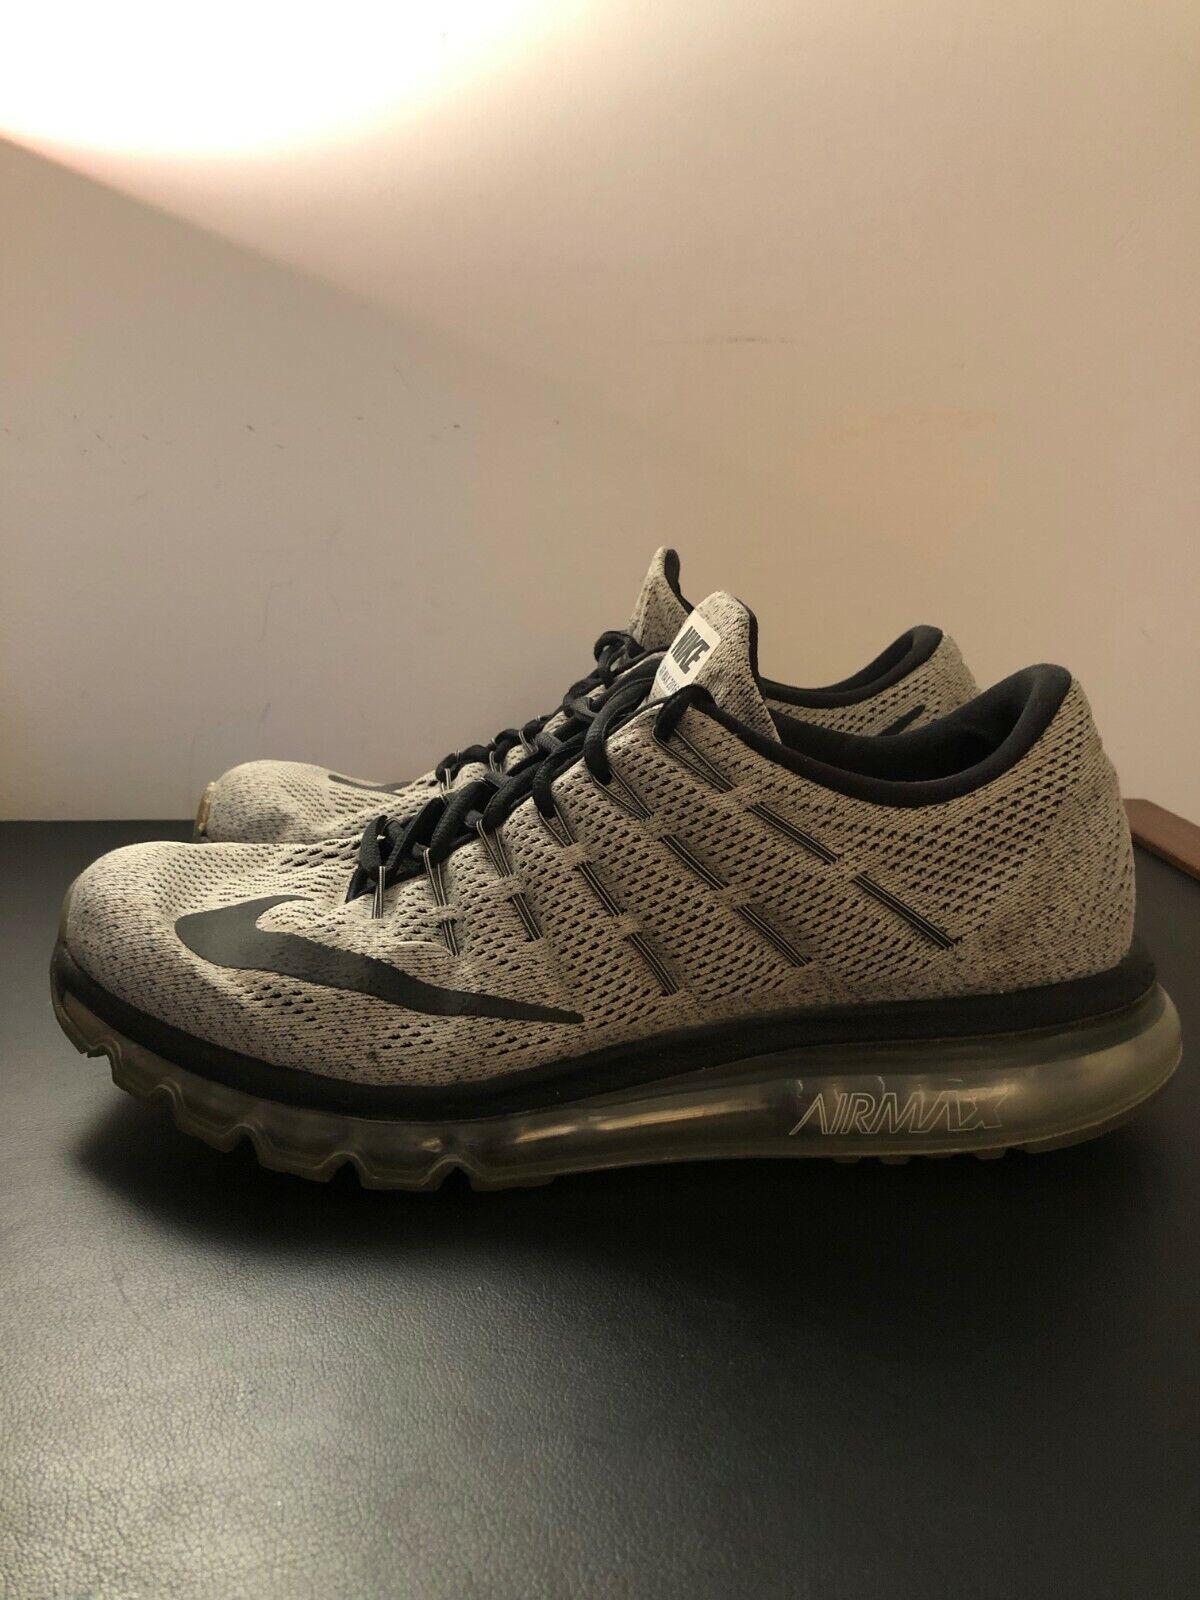 Nike Air Max 2016 Oreo Grey White Black Mens Size 11.5